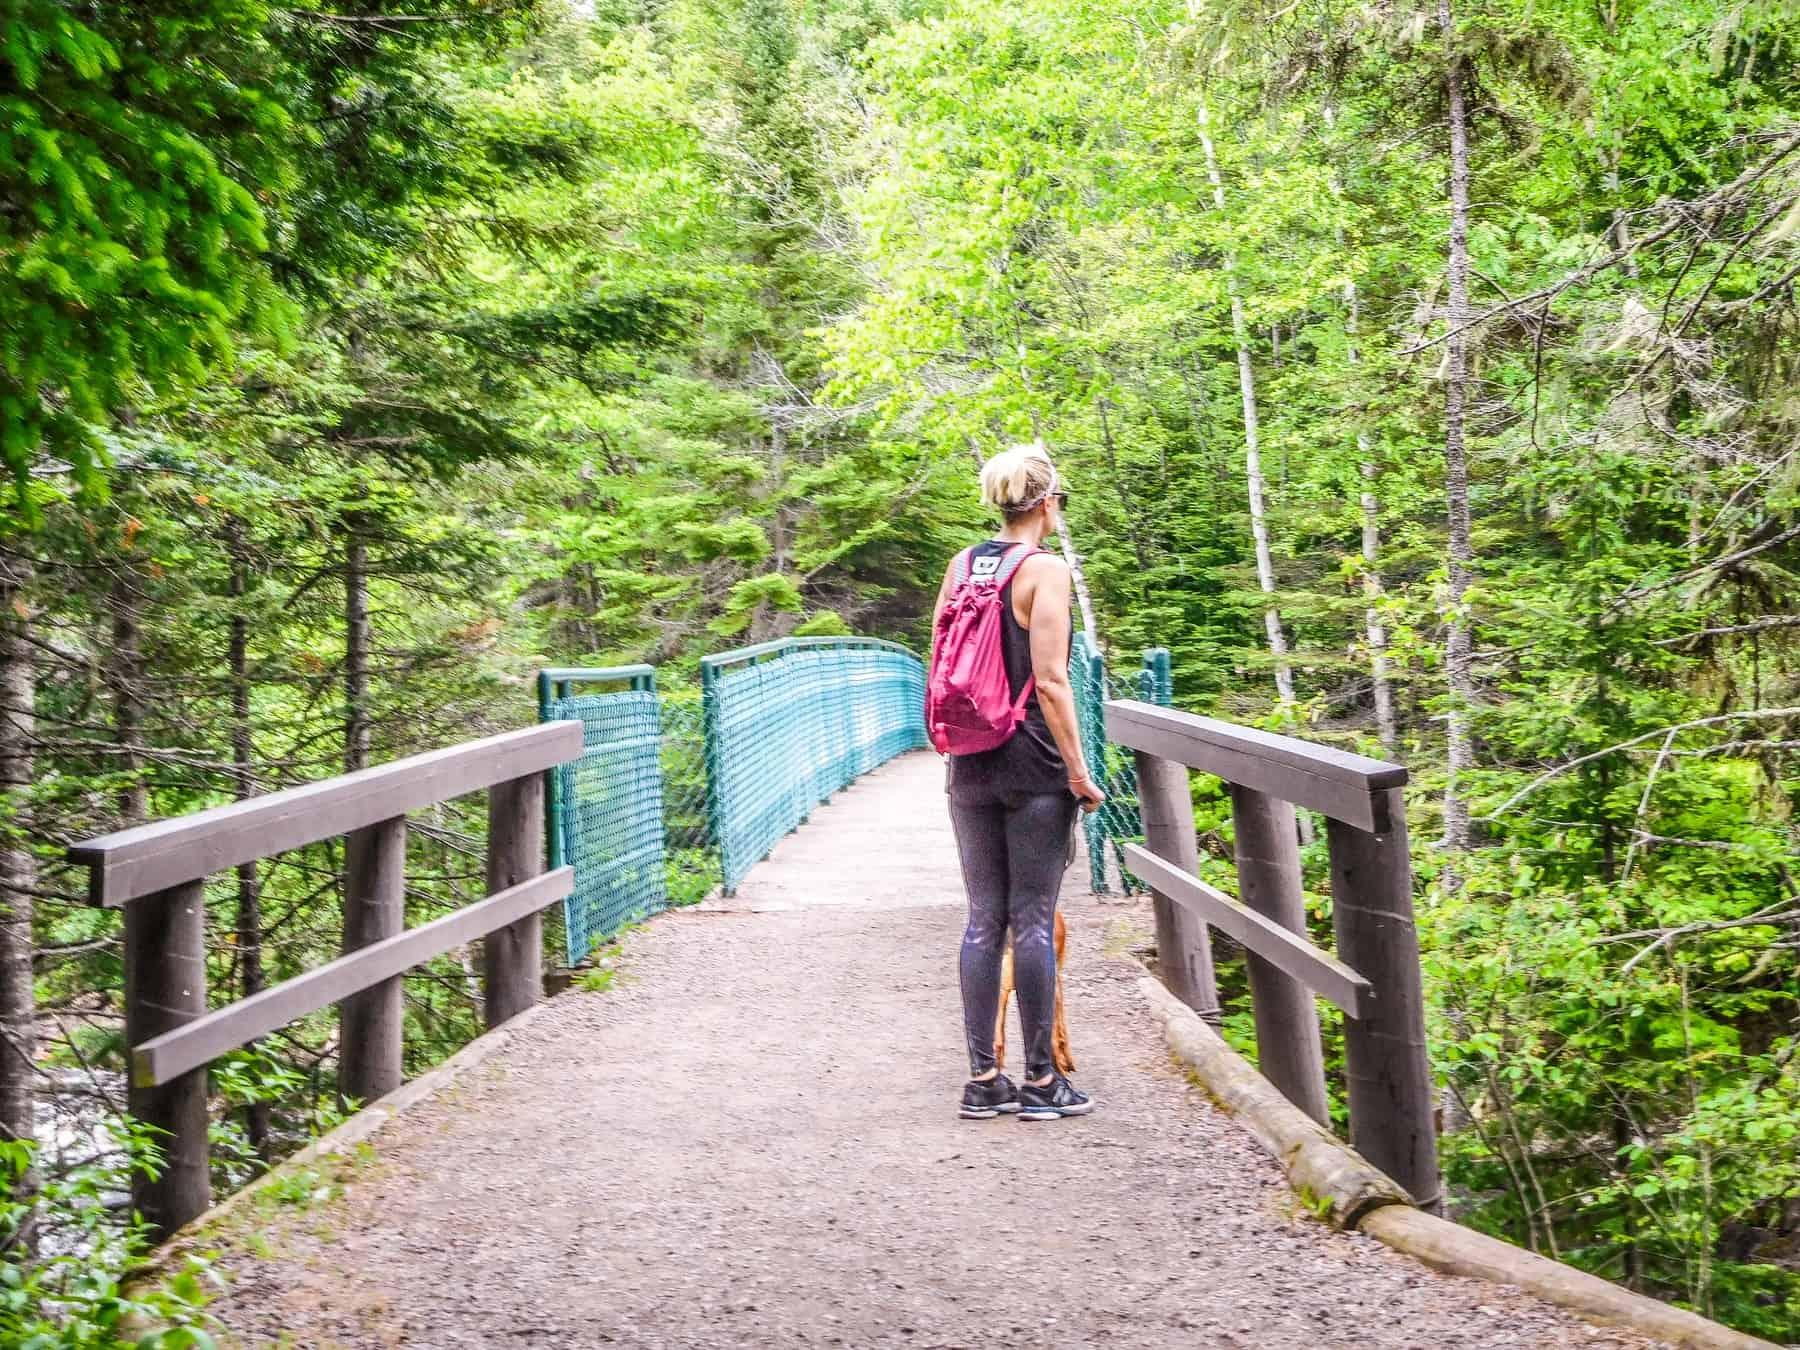 Take a hike at Judge CR Magney State Park near Hovland Minnesota